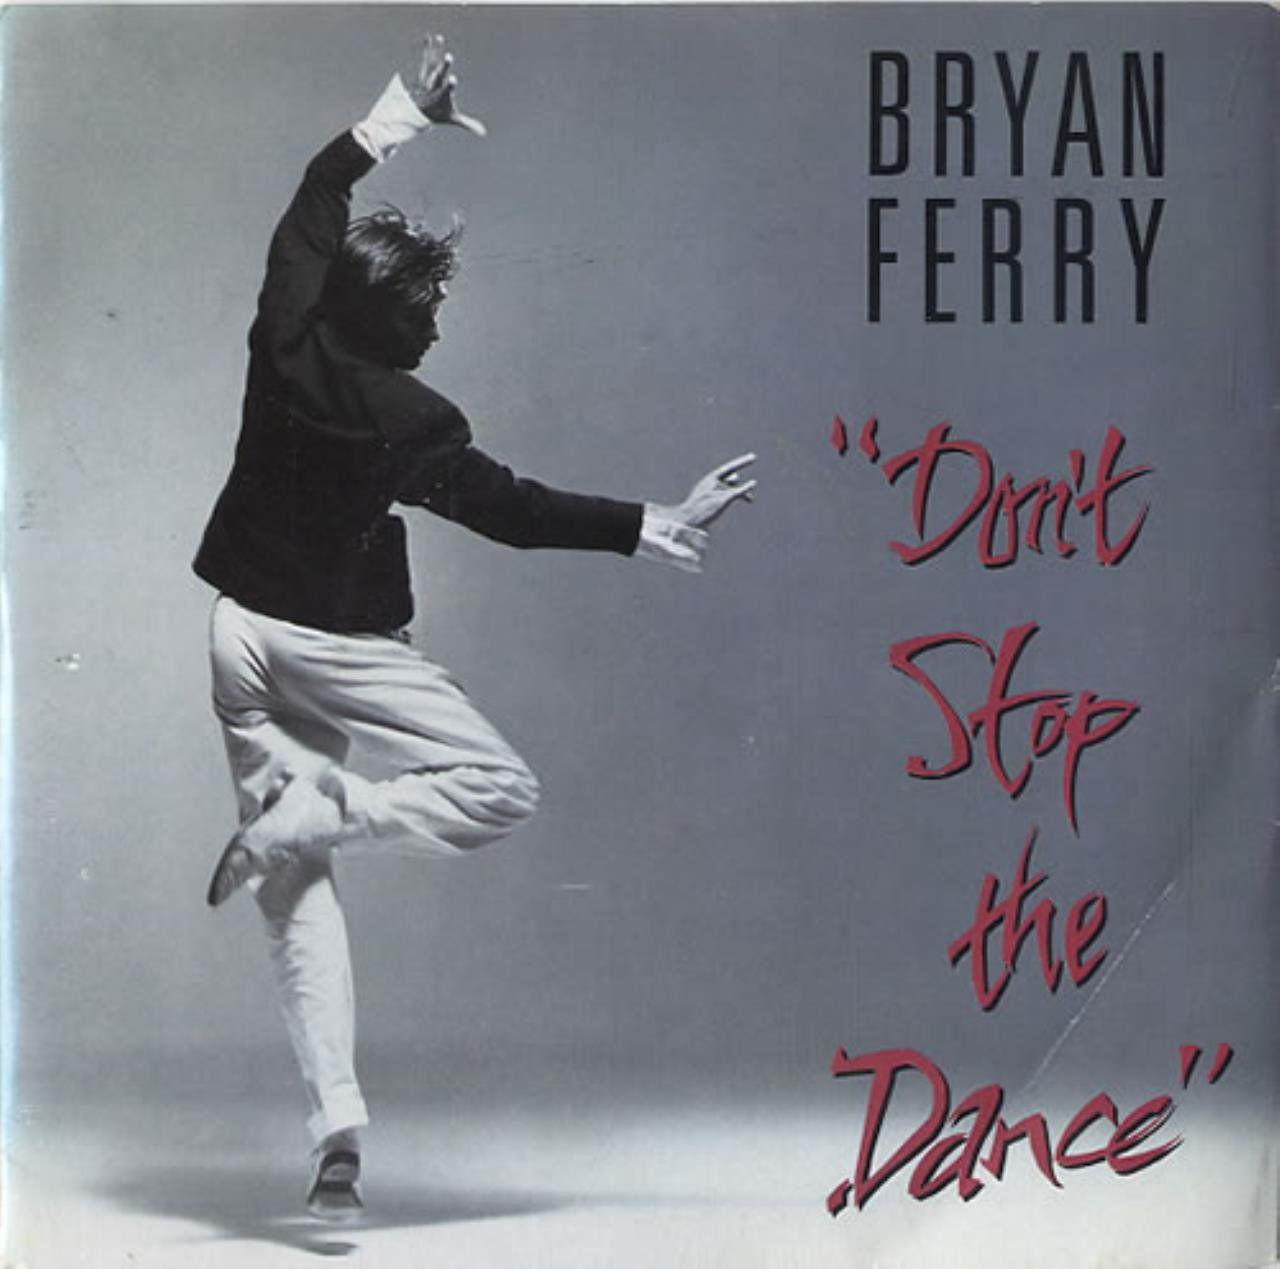 Bryan Ferry's